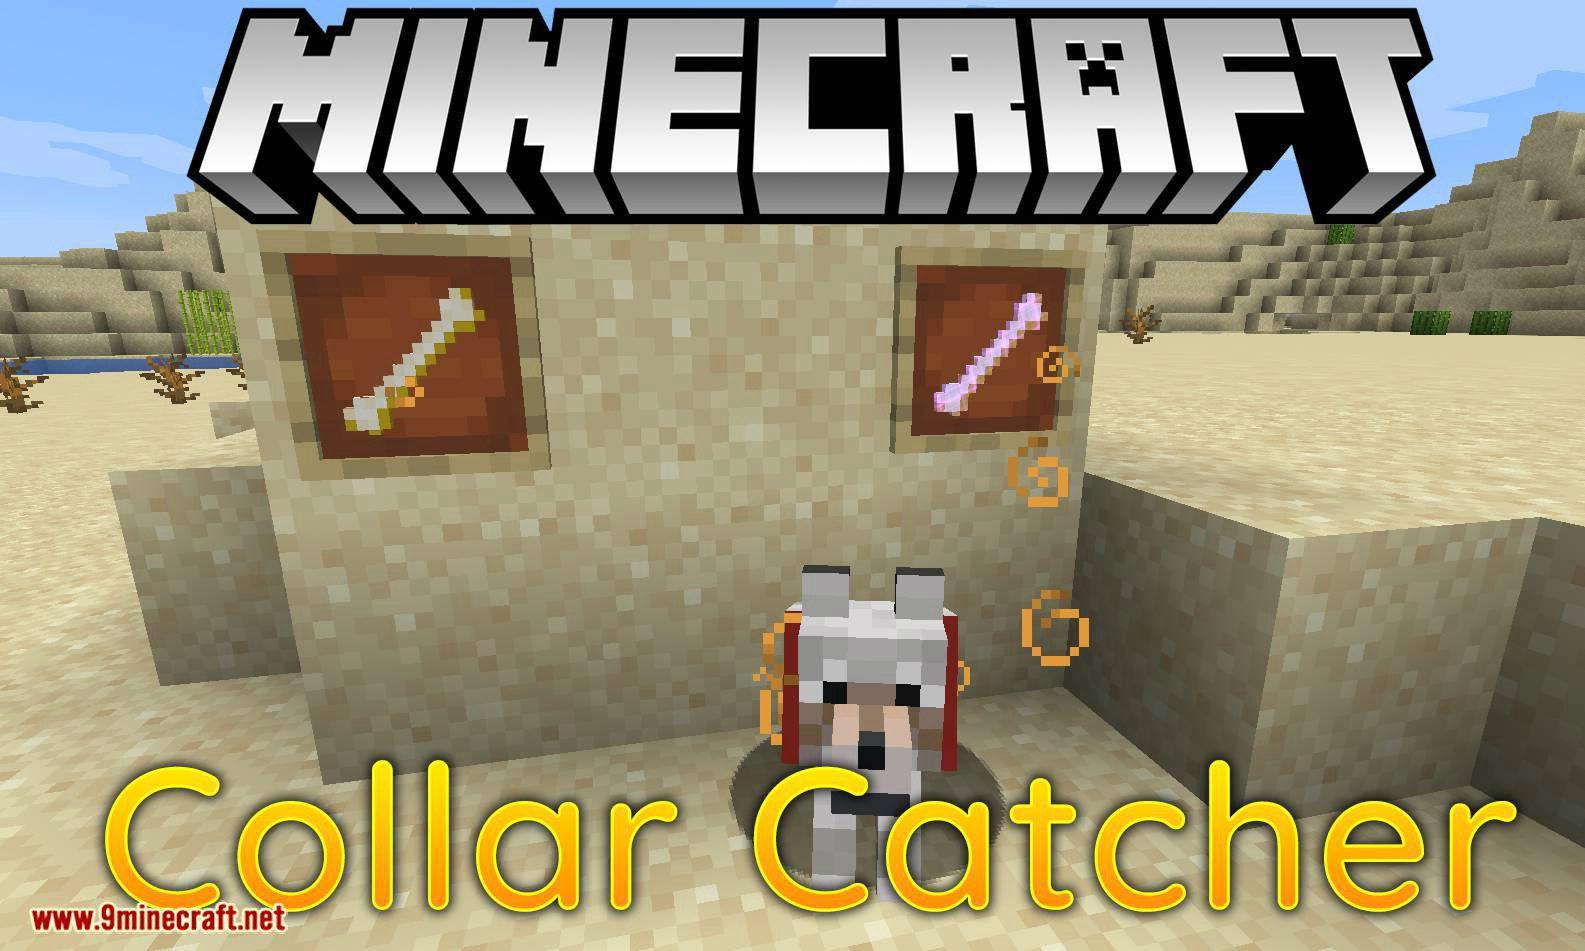 Collar Catcher mod for minecraft logo